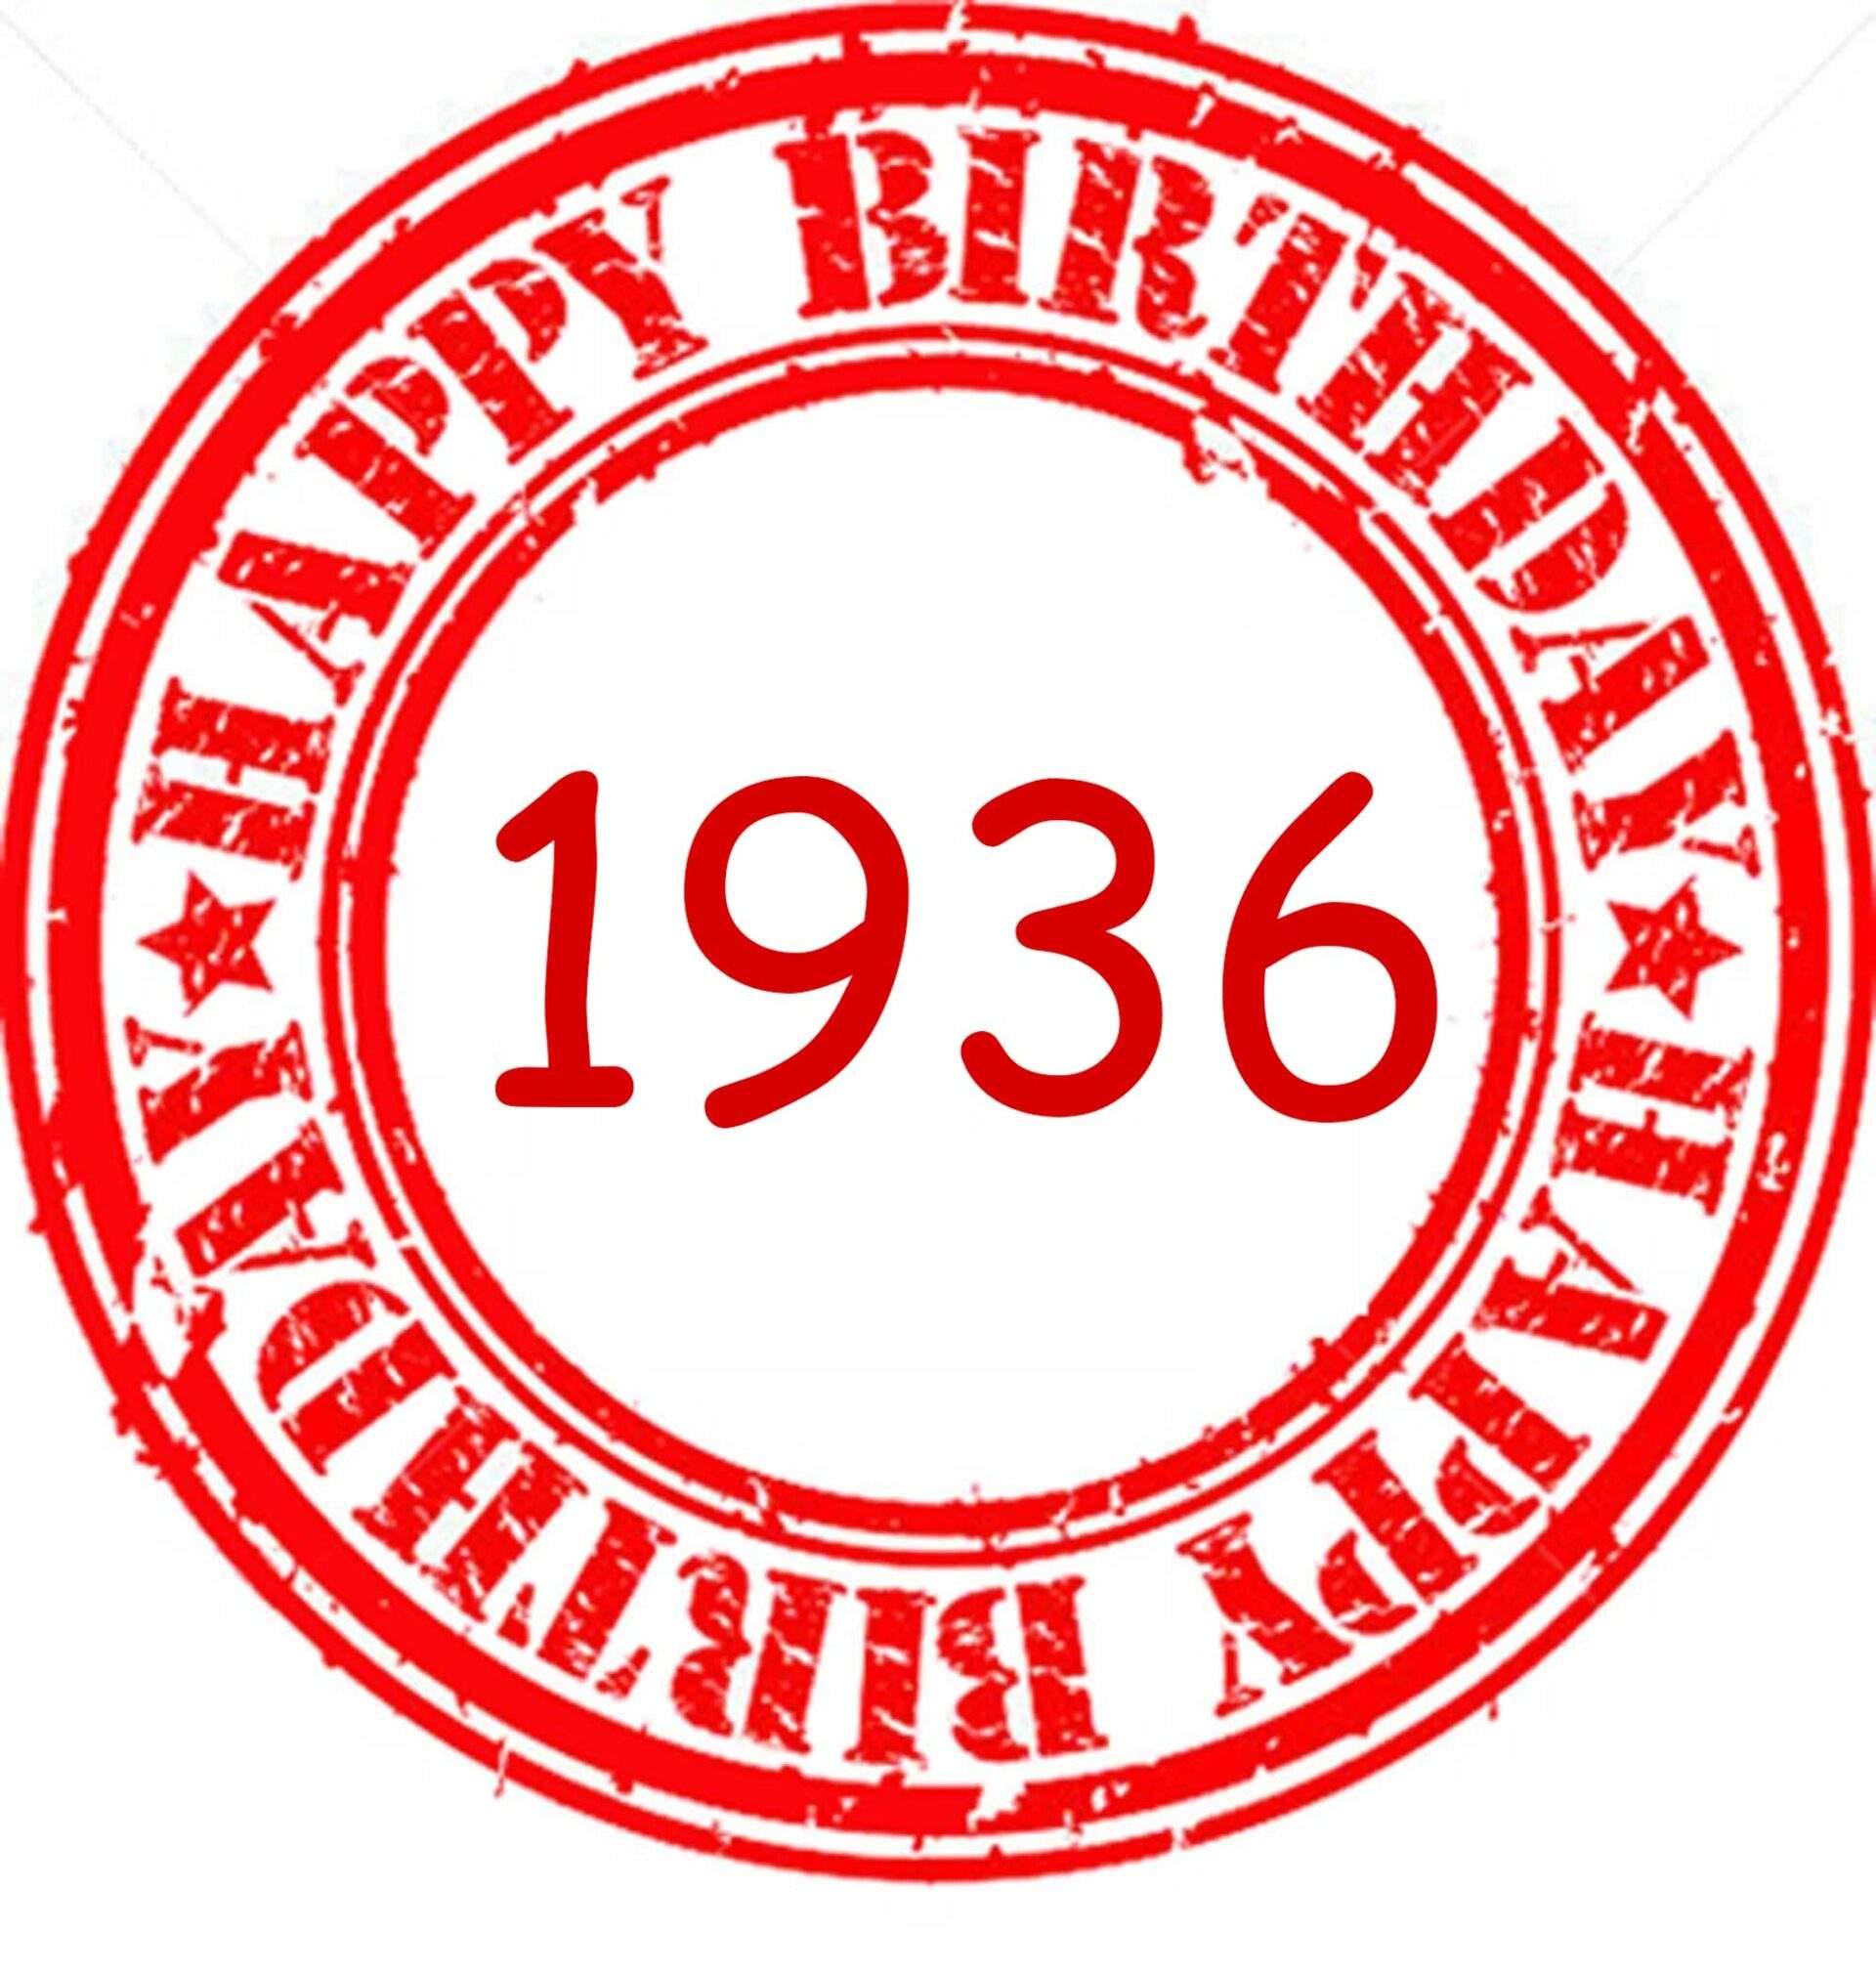 happy birthday 1936